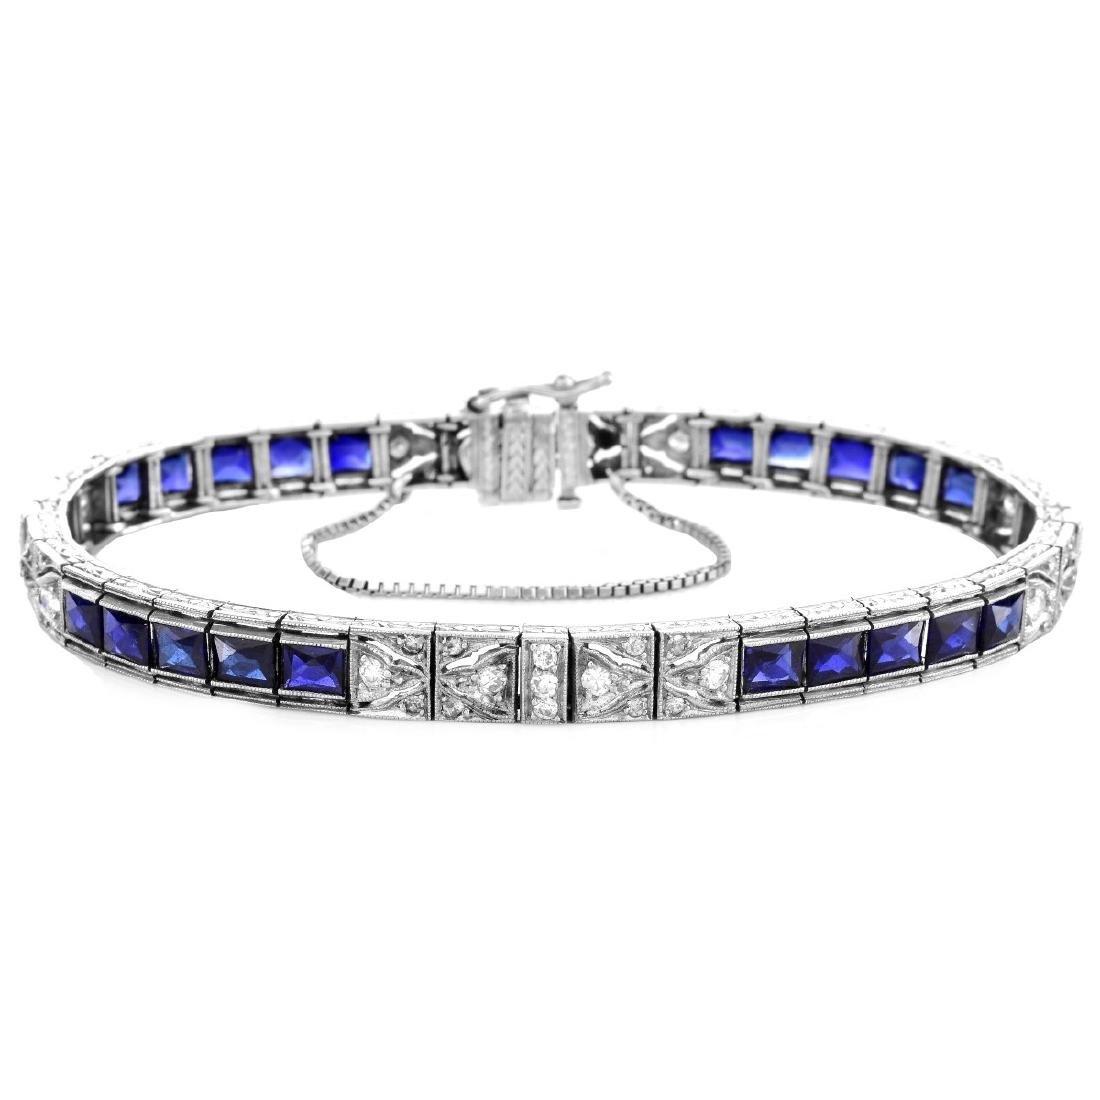 Art Deco Diamond, Sapphire and Platinum Bracelet